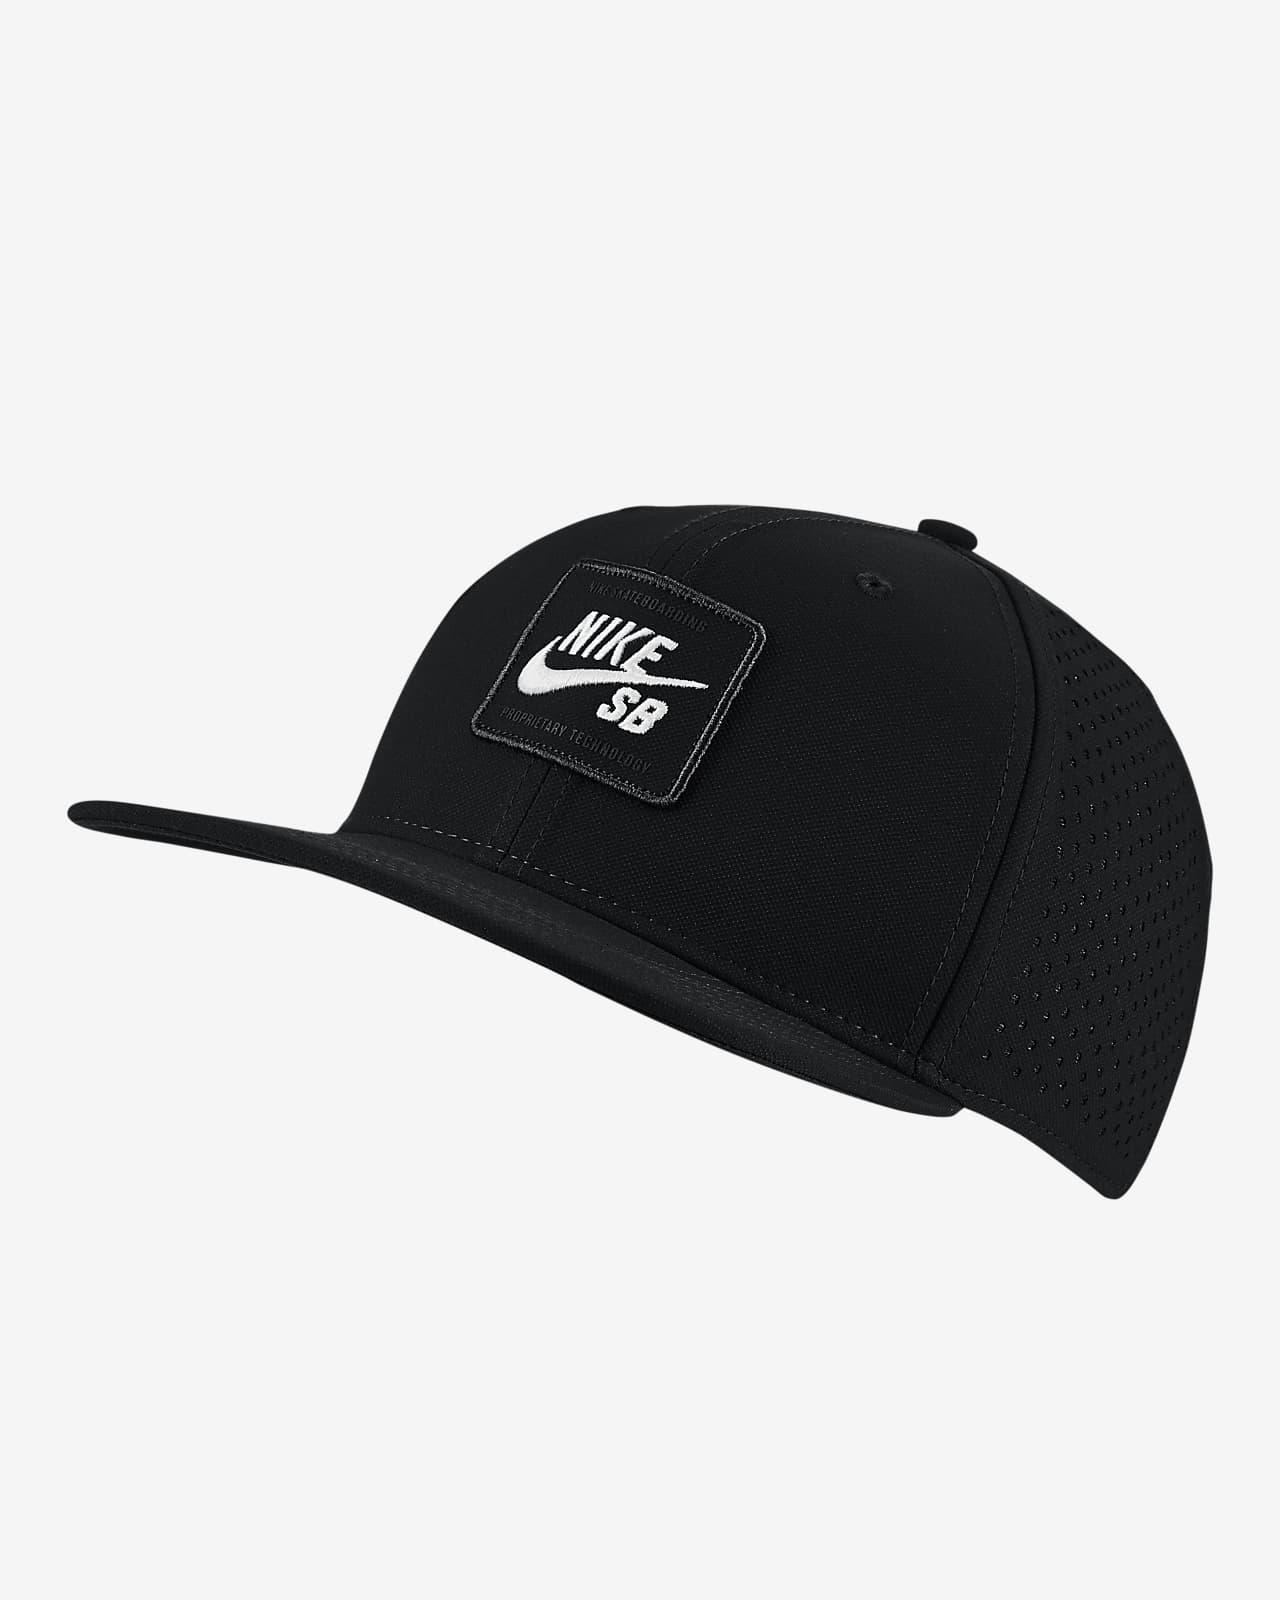 Nike SB AeroBill Pro 2.0 Skate Hat. Nike LU